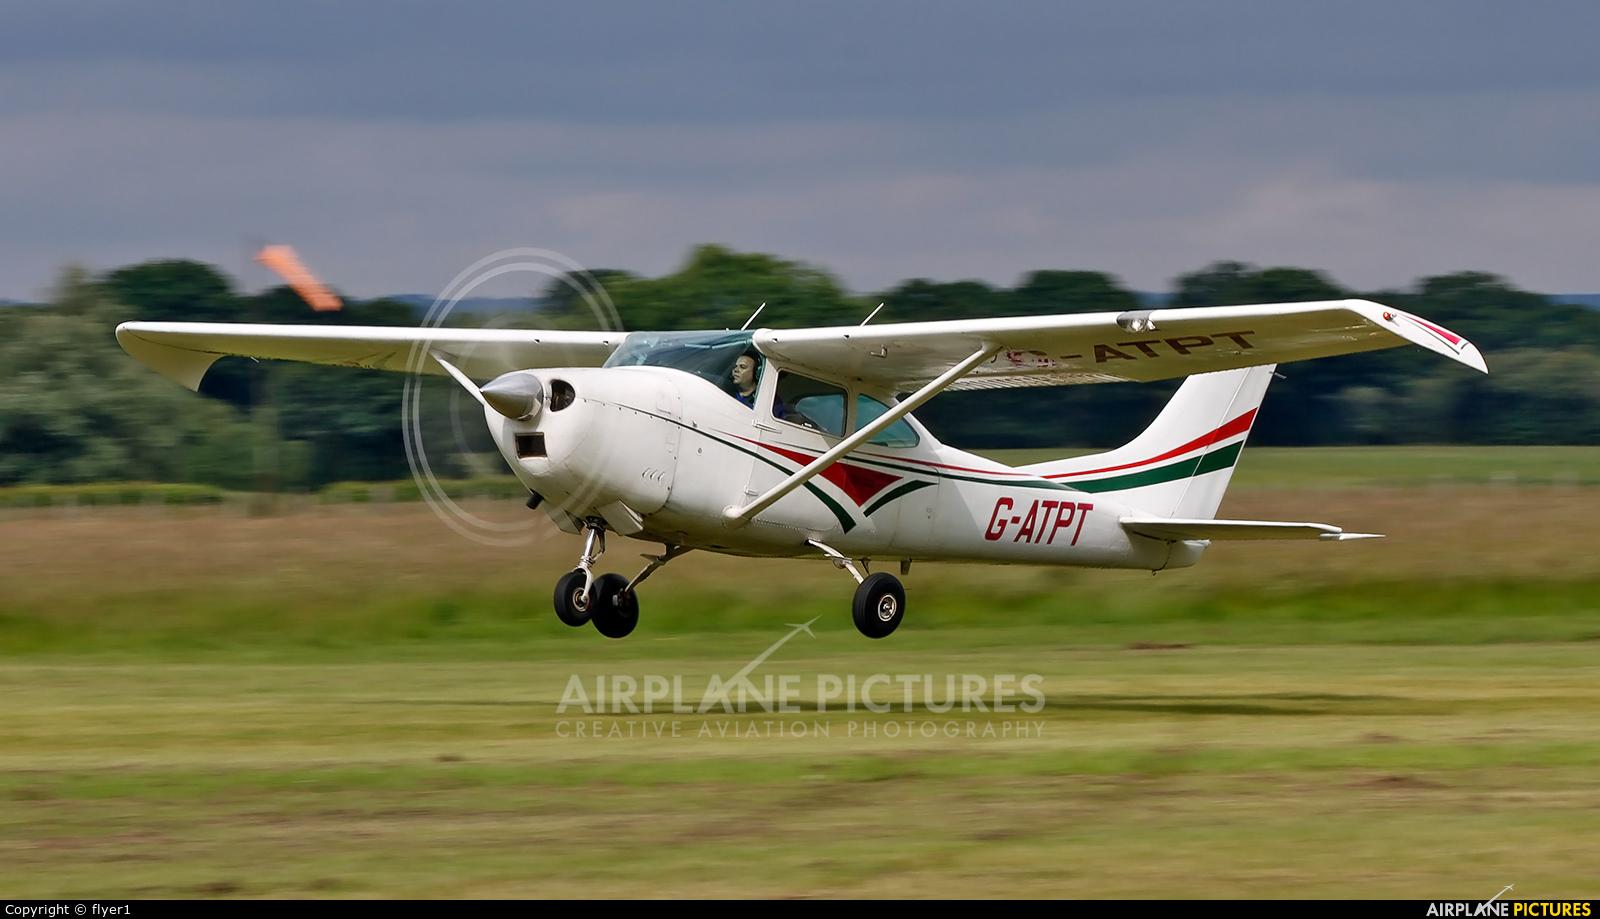 Private G-ATPT aircraft at Lashenden / Headcorn